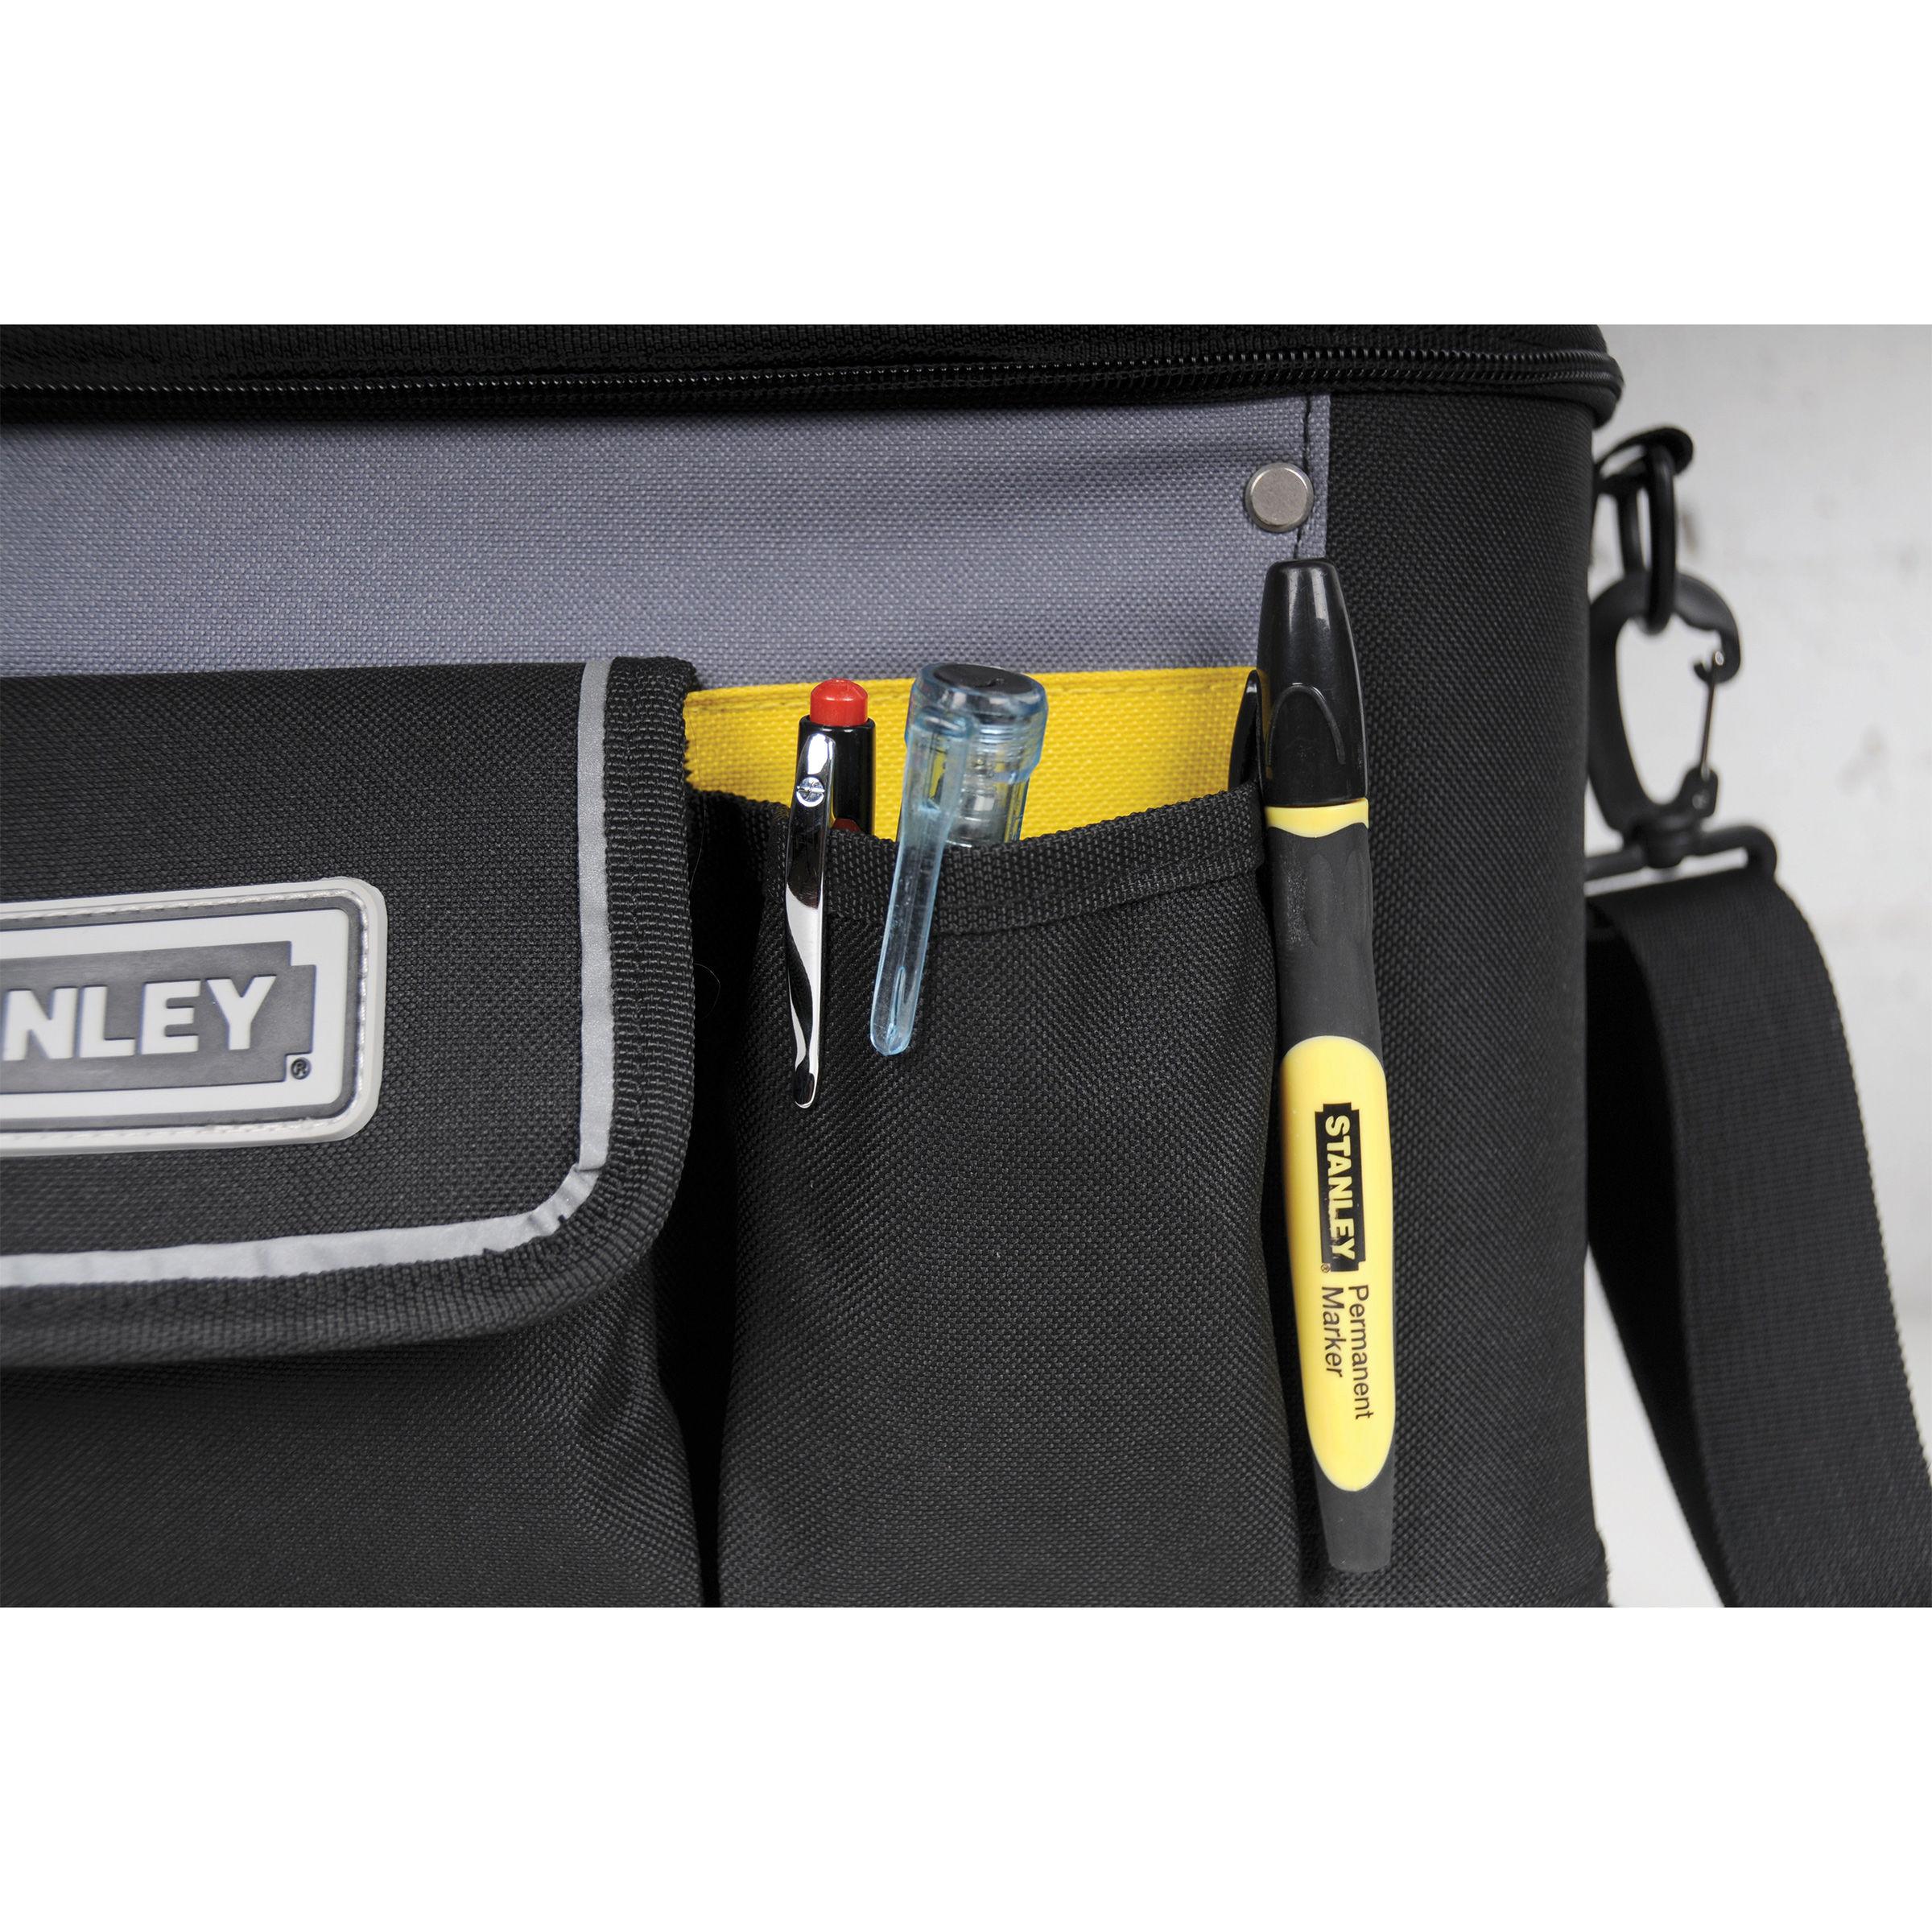 Stanley STA196193 Rigid multi usage toolbag 16in